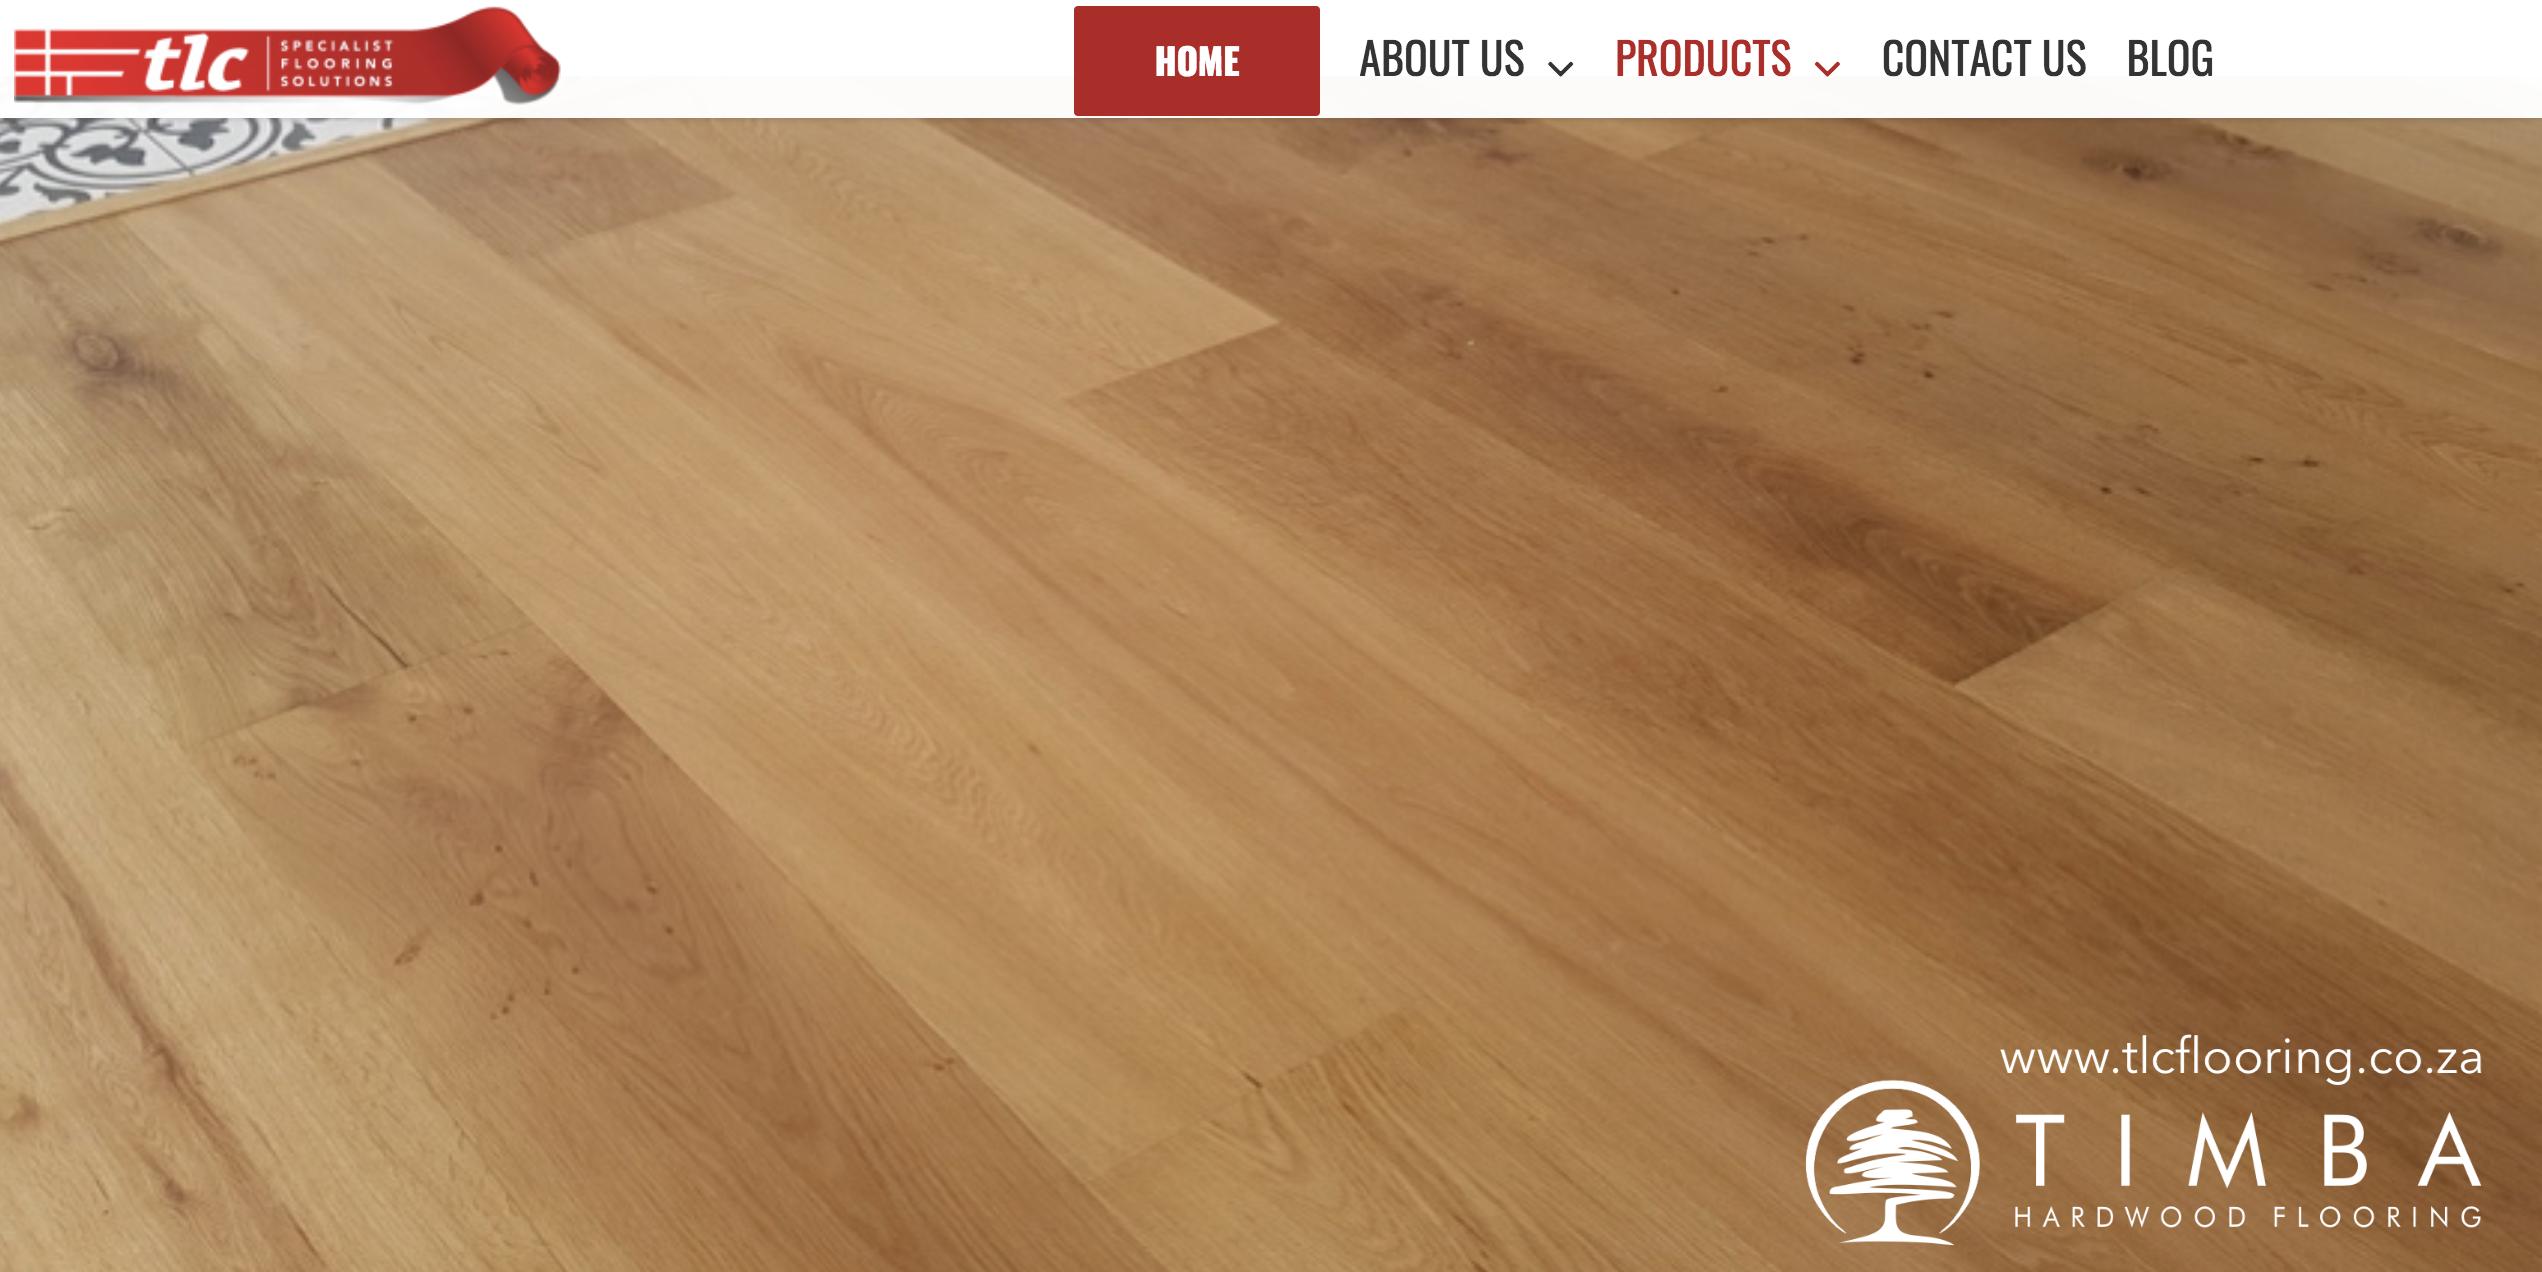 Timba Hardwood Flooring Hardwood Floors Hardwood Flooring